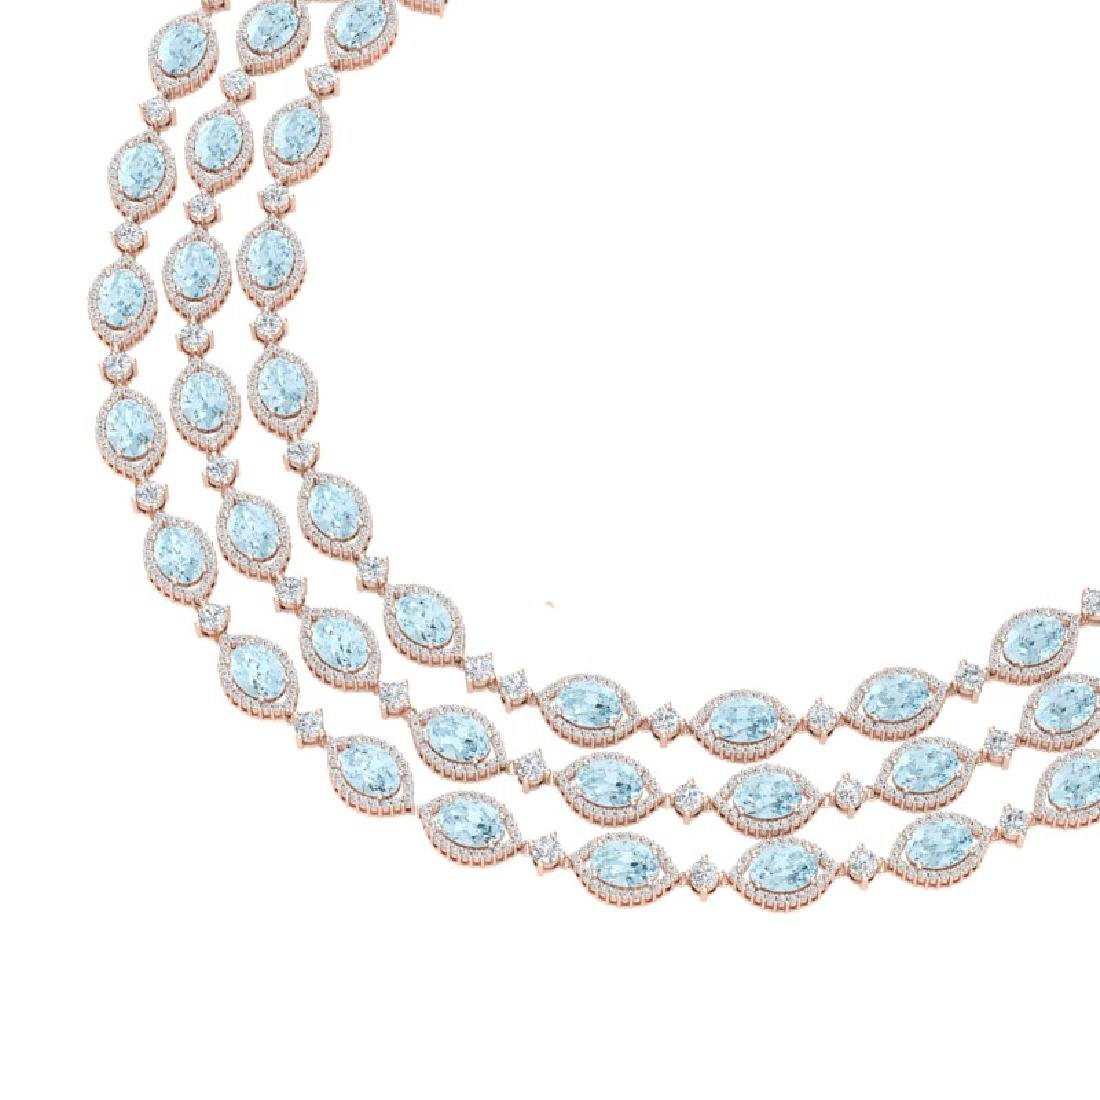 84.57 CTW Royalty Sky Topaz & VS Diamond Necklace 18K